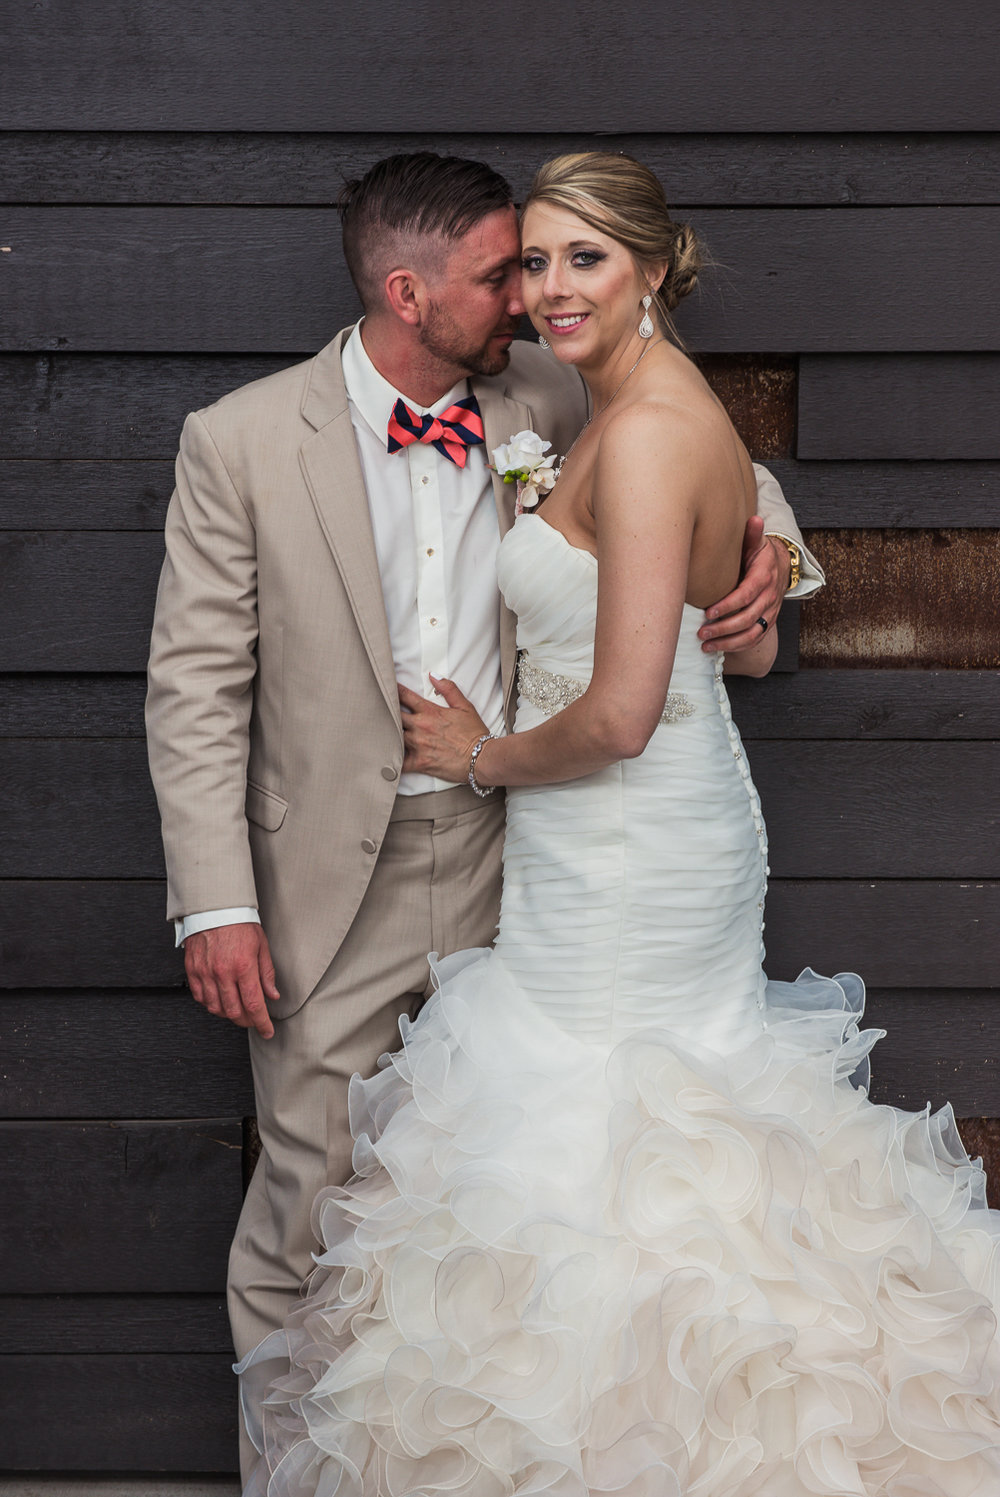 RKH Images - Best of 2016 - Minnesota Wedding Photographer -58.jpg